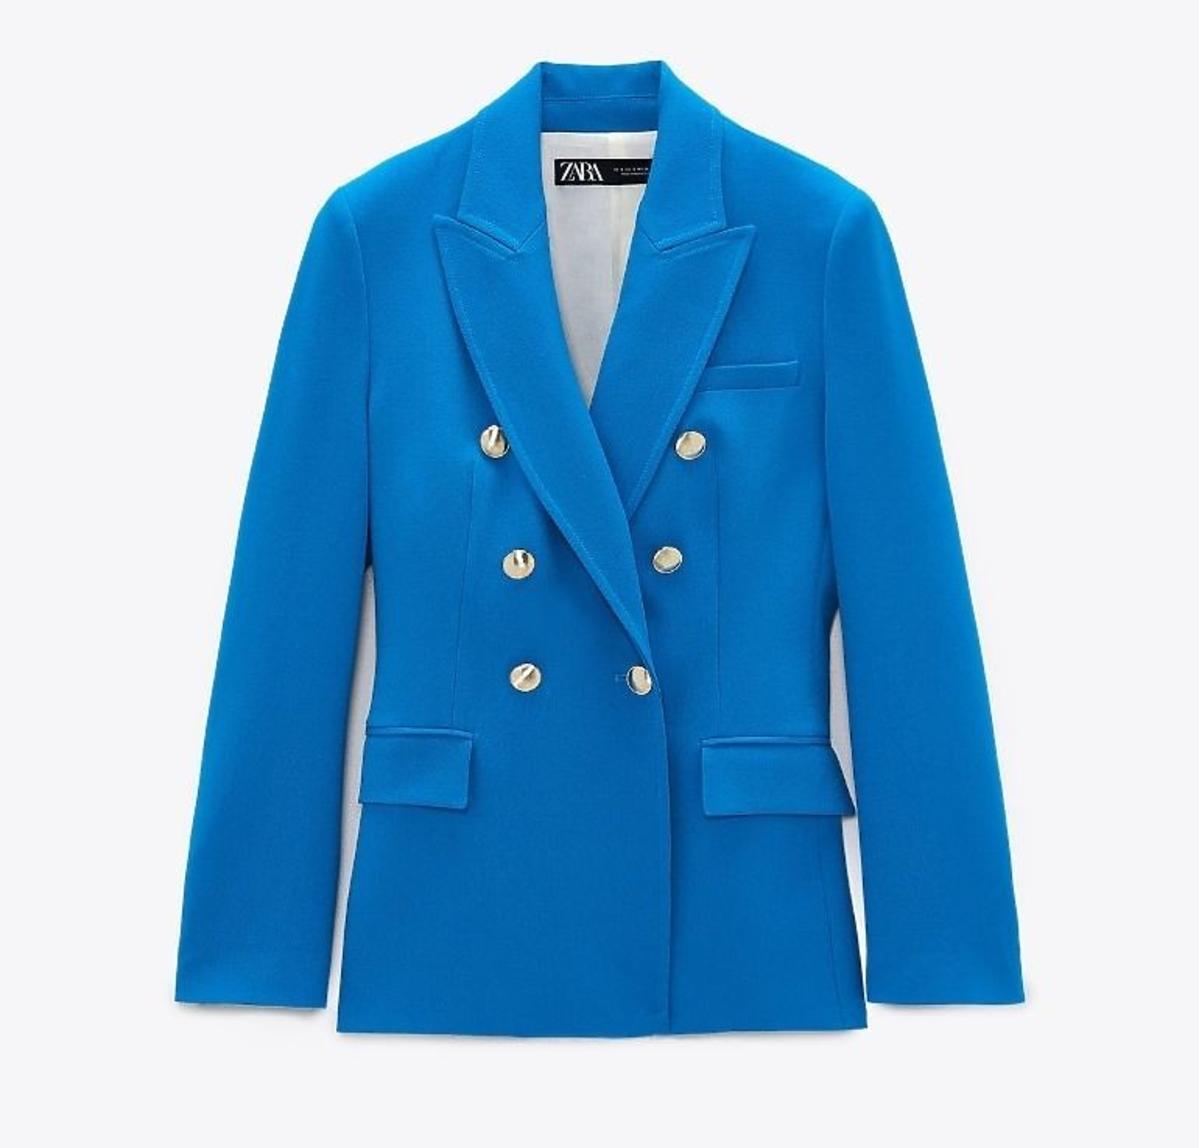 Niebieska marynarka Zara